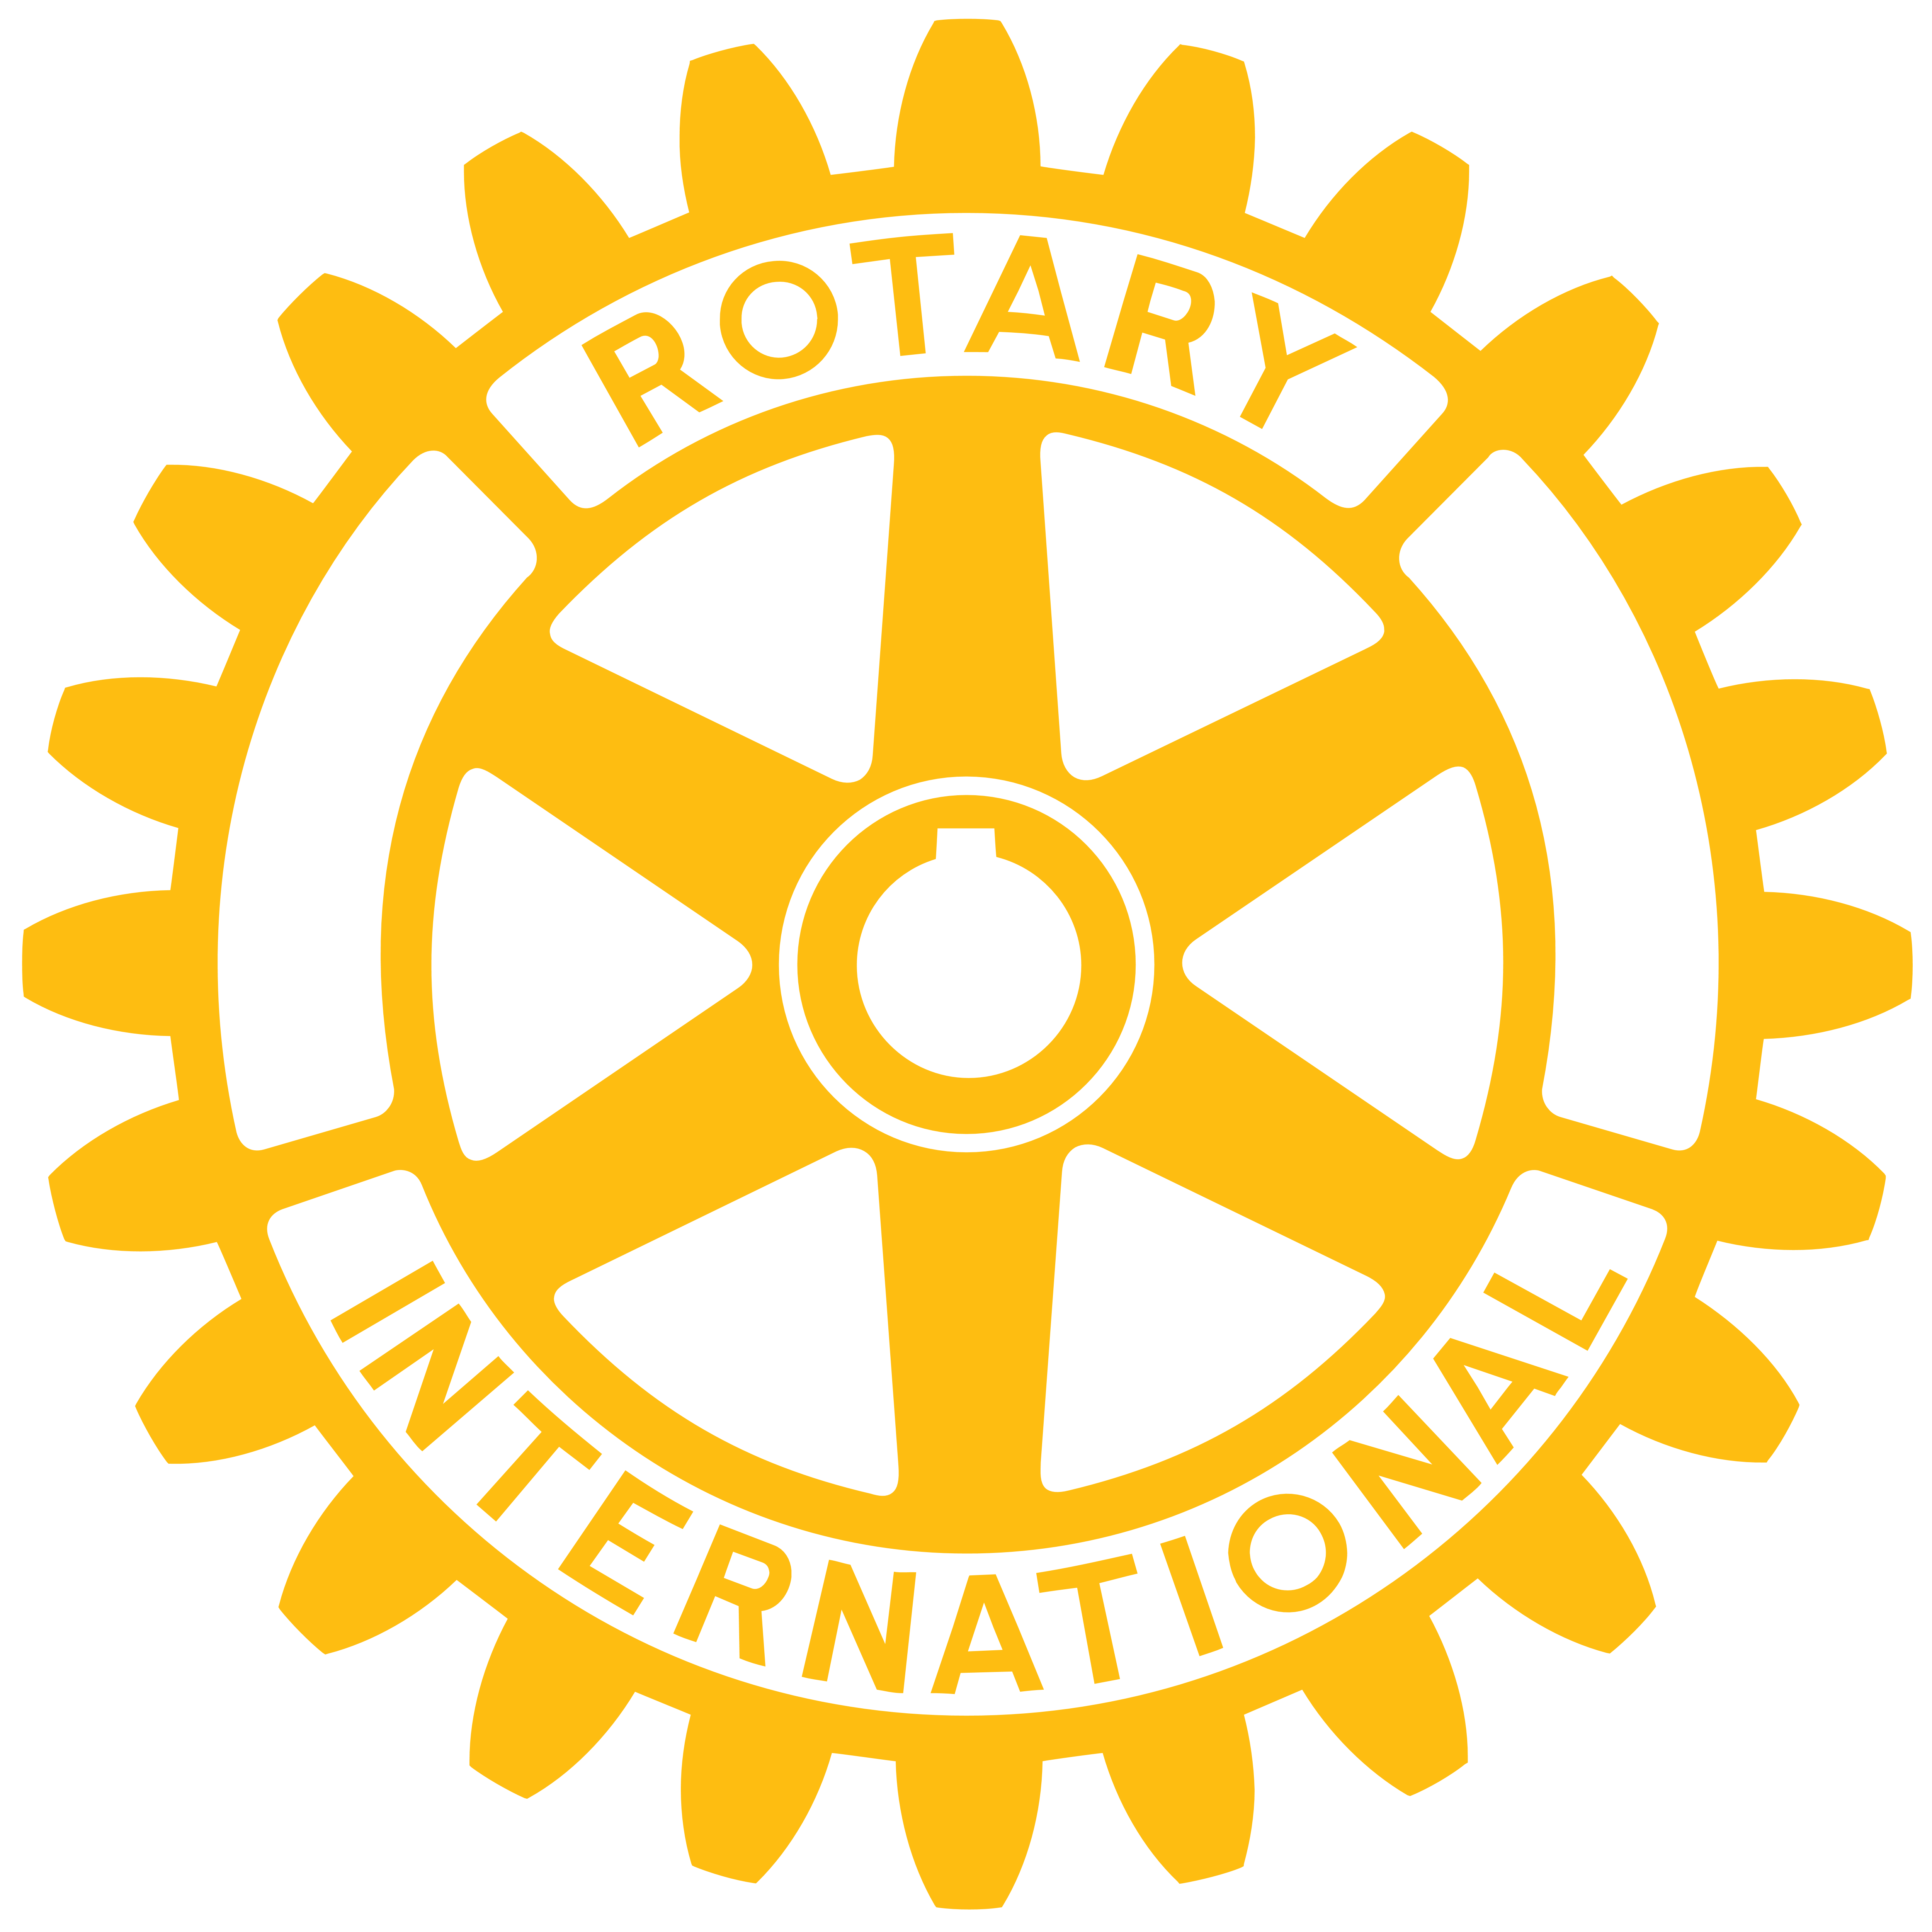 Rotary International.